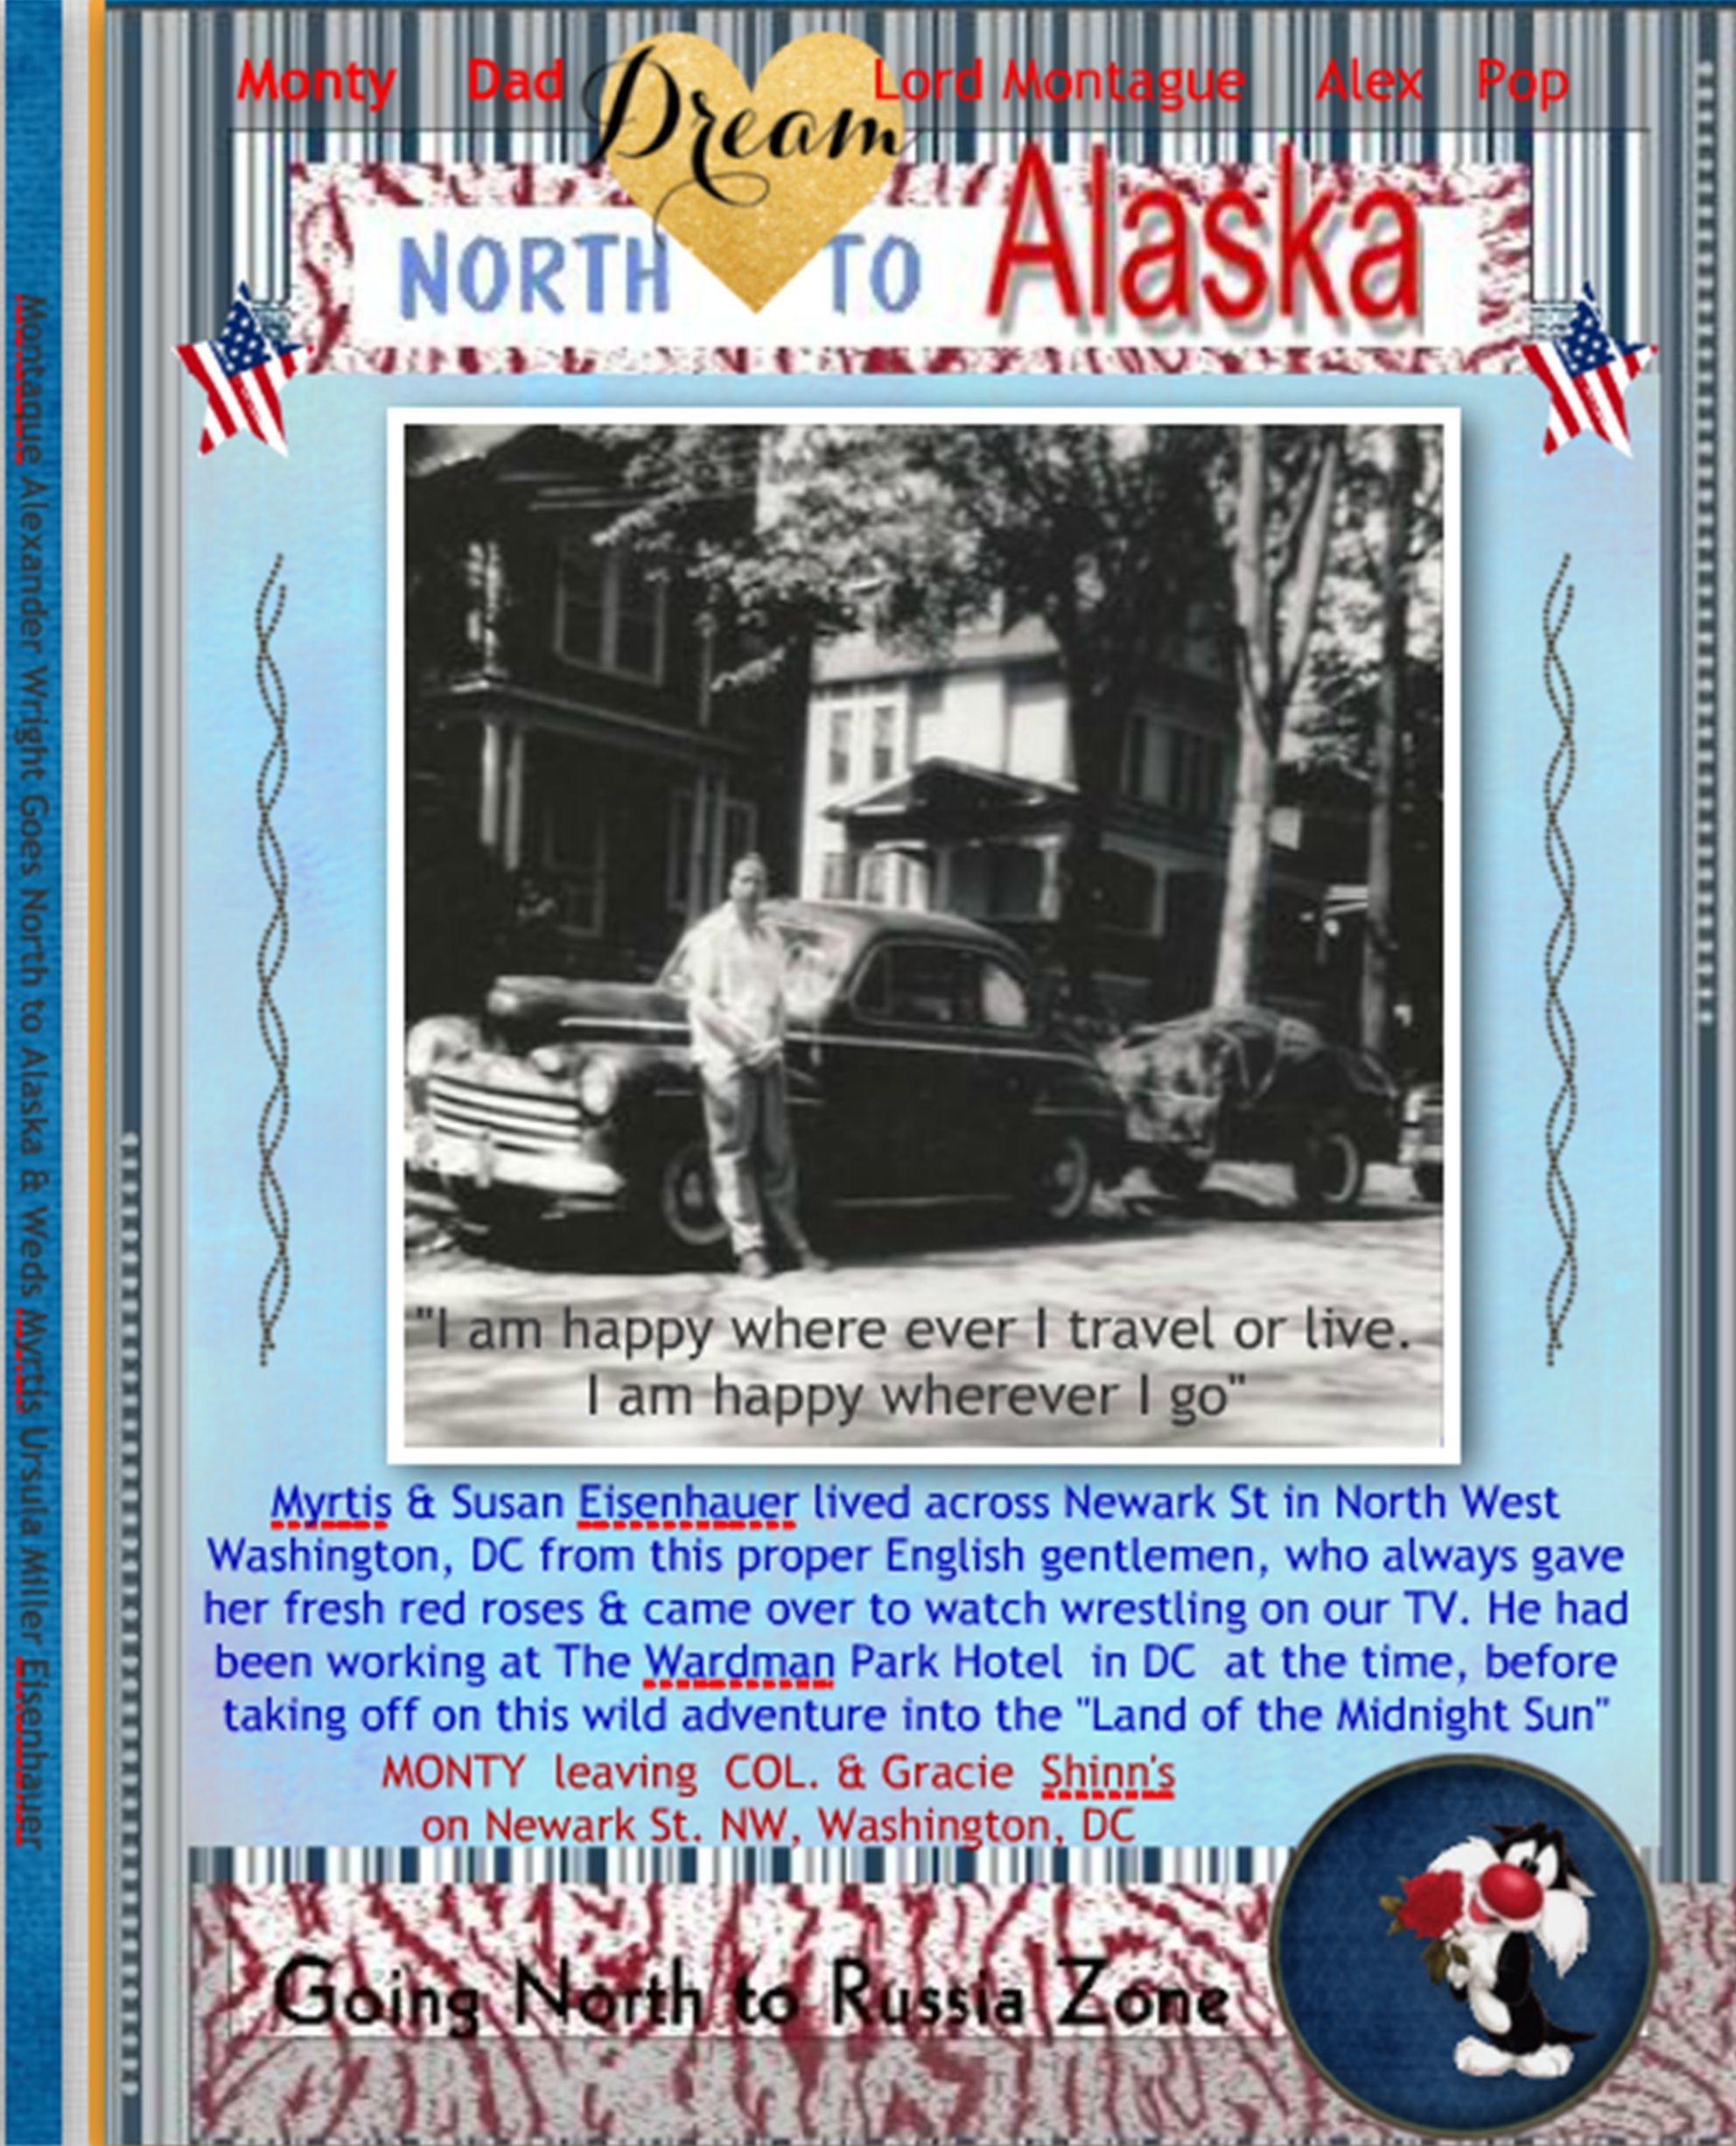 Alex leaves Washington DC to drive to Homer, Territory of Alaska 1952